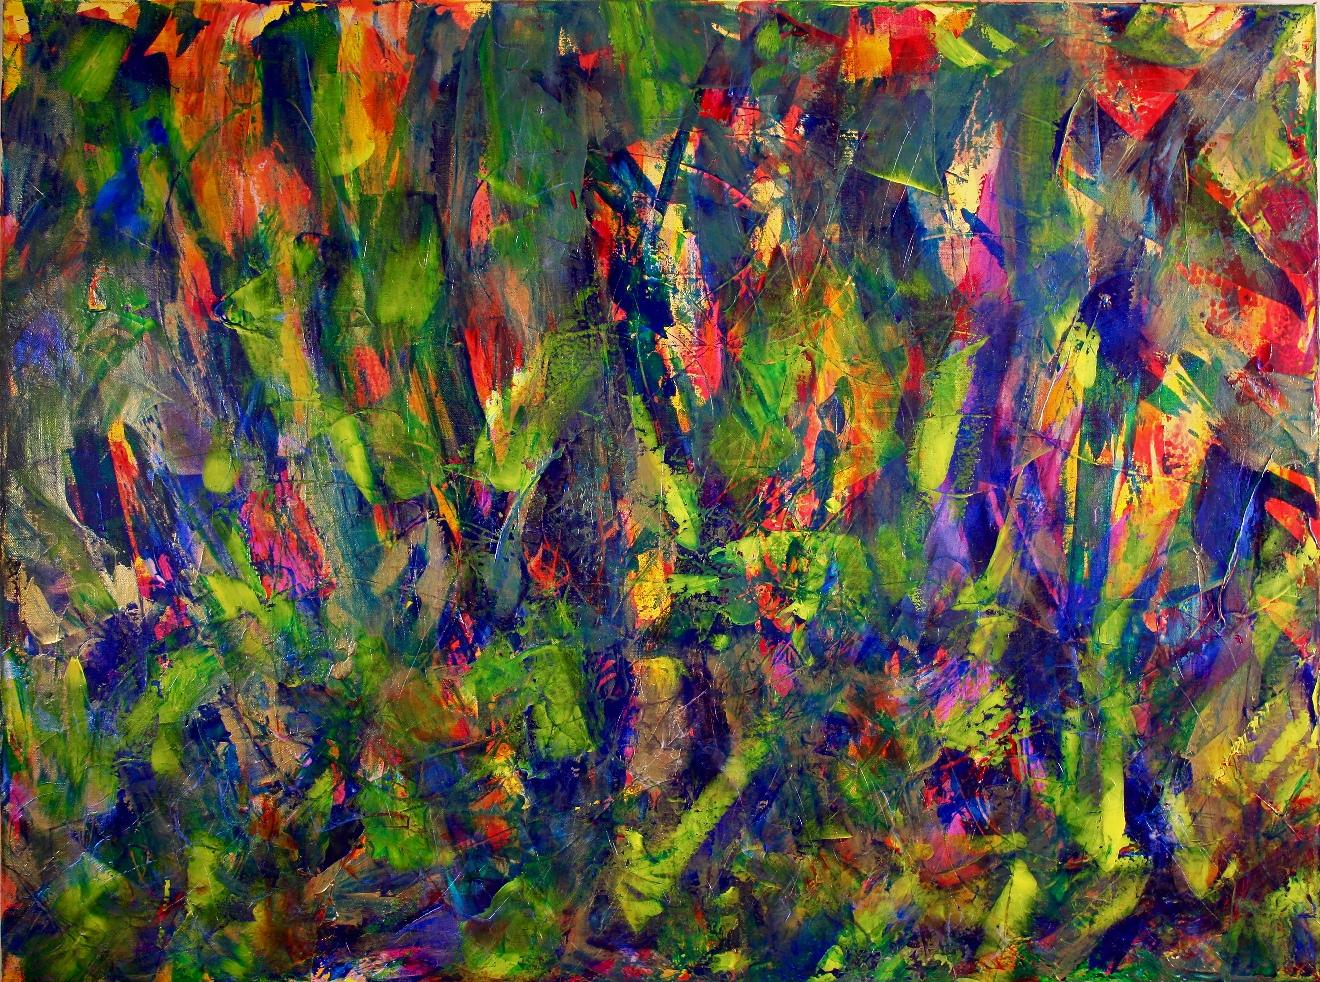 Green Terrain (Green Dimensions) by Nestor Toro